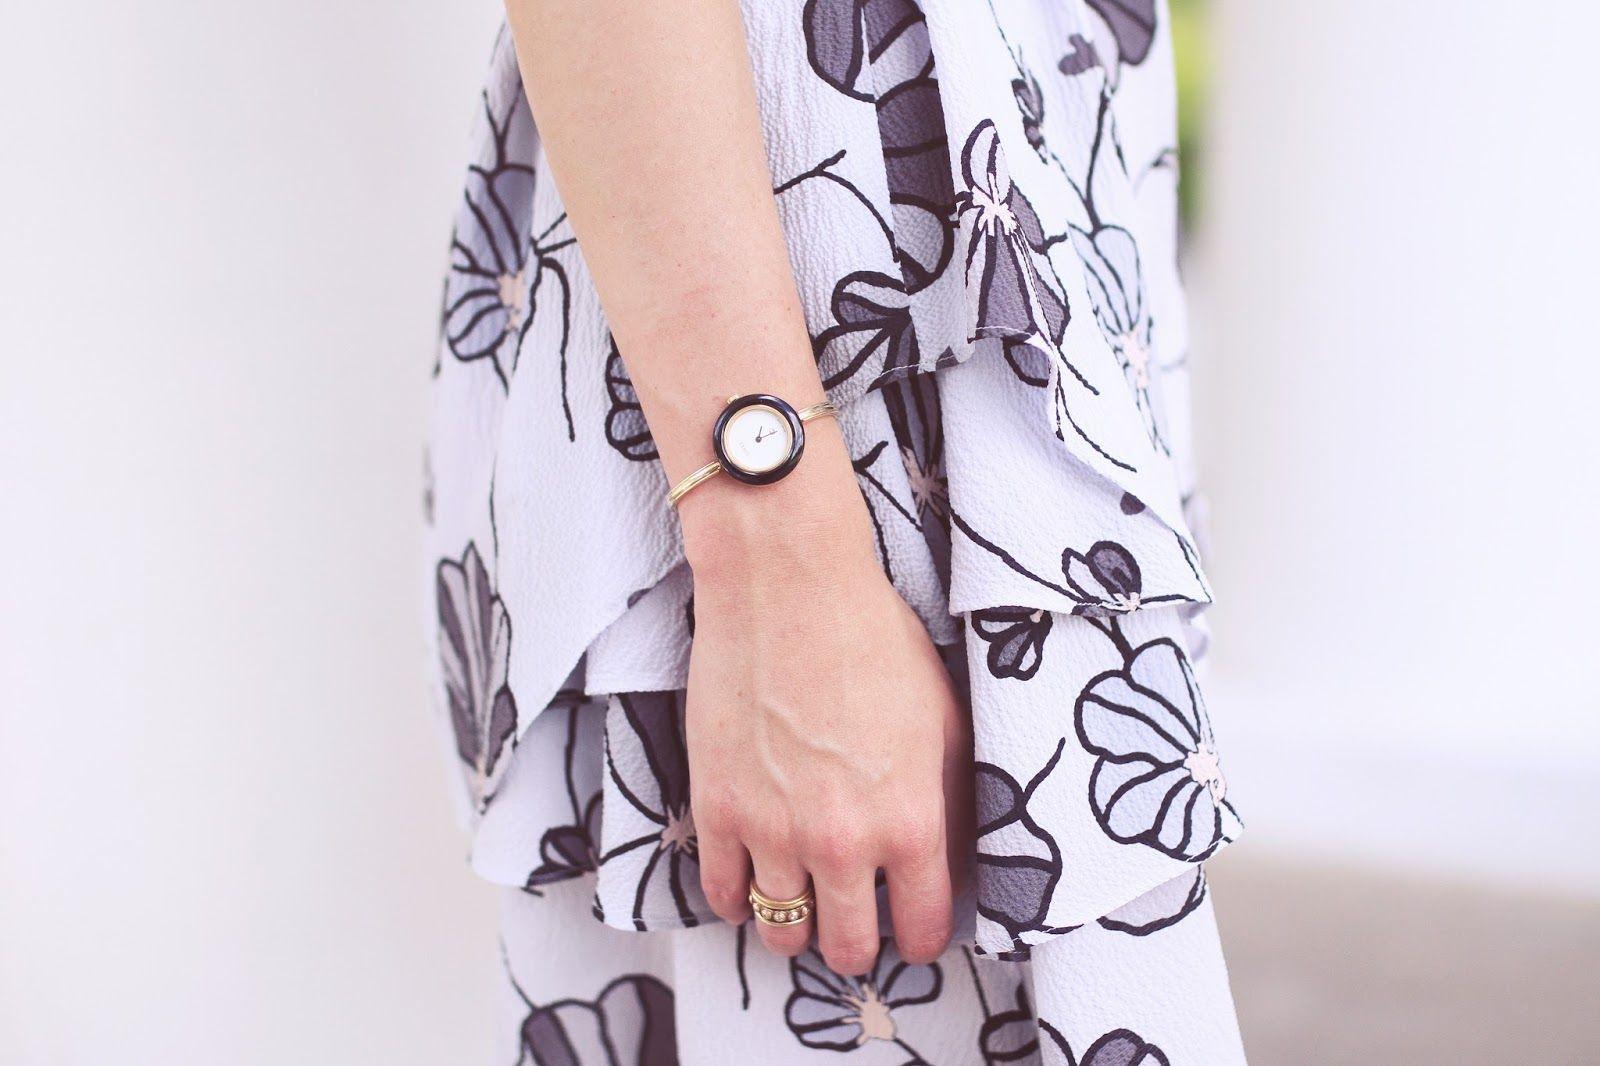 Emilee Anne wearing Derek Lam 10 Crosby Sleeveless Shirtdress // Chanel Belt // Christian Louboutin Espadrilles // Celine Sunglasses